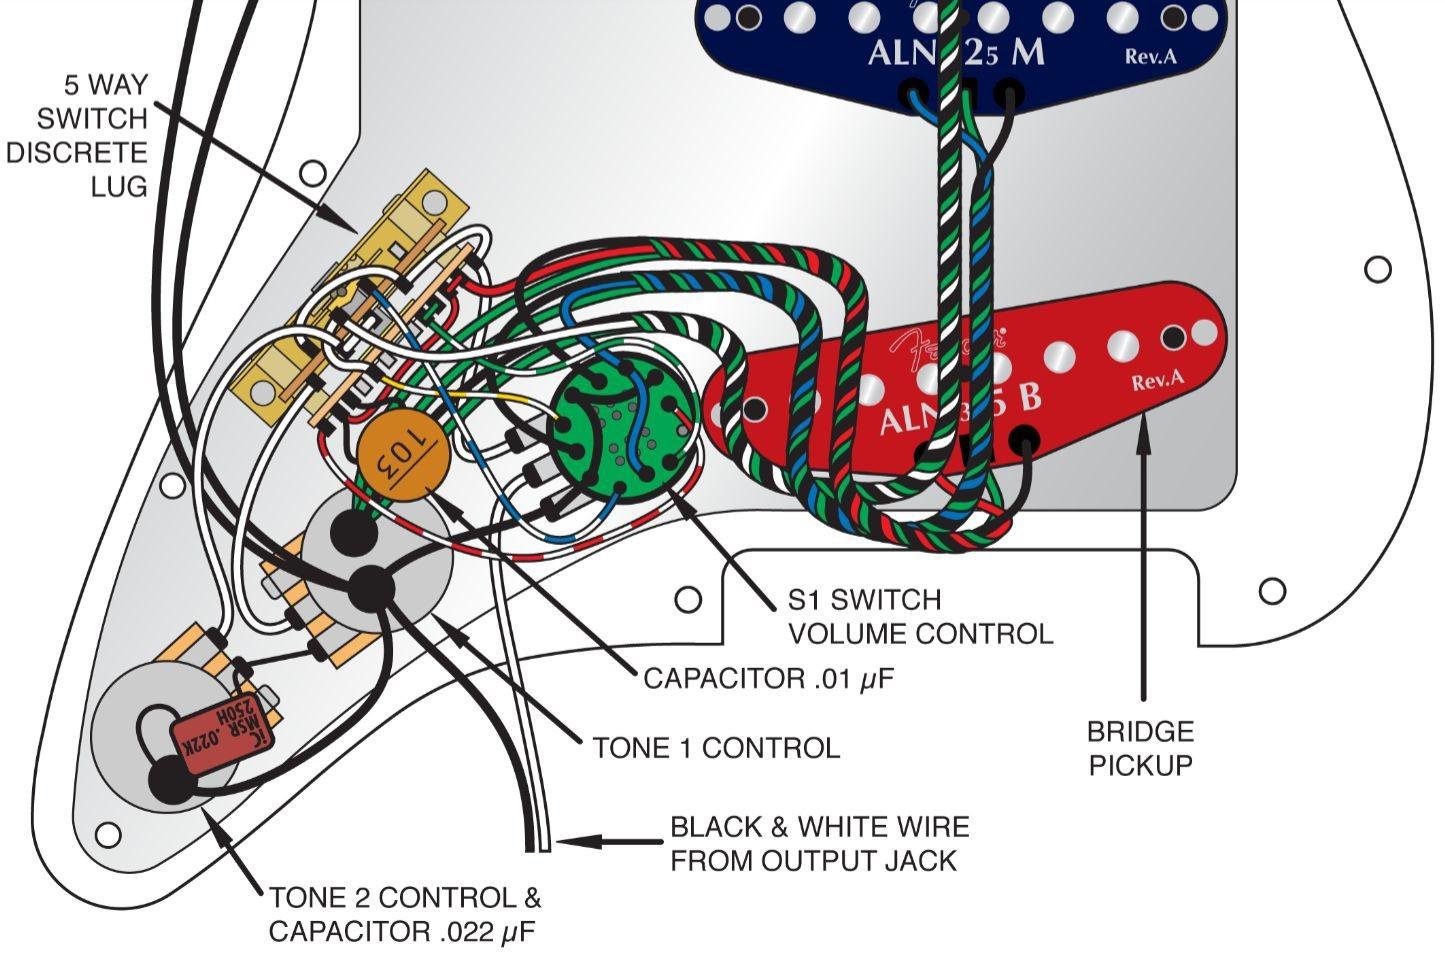 fender strat wiring diagrams releaseganji net rh releaseganji net Fender HH Strat Split Coil Wiring Fender Wiring Diagrams